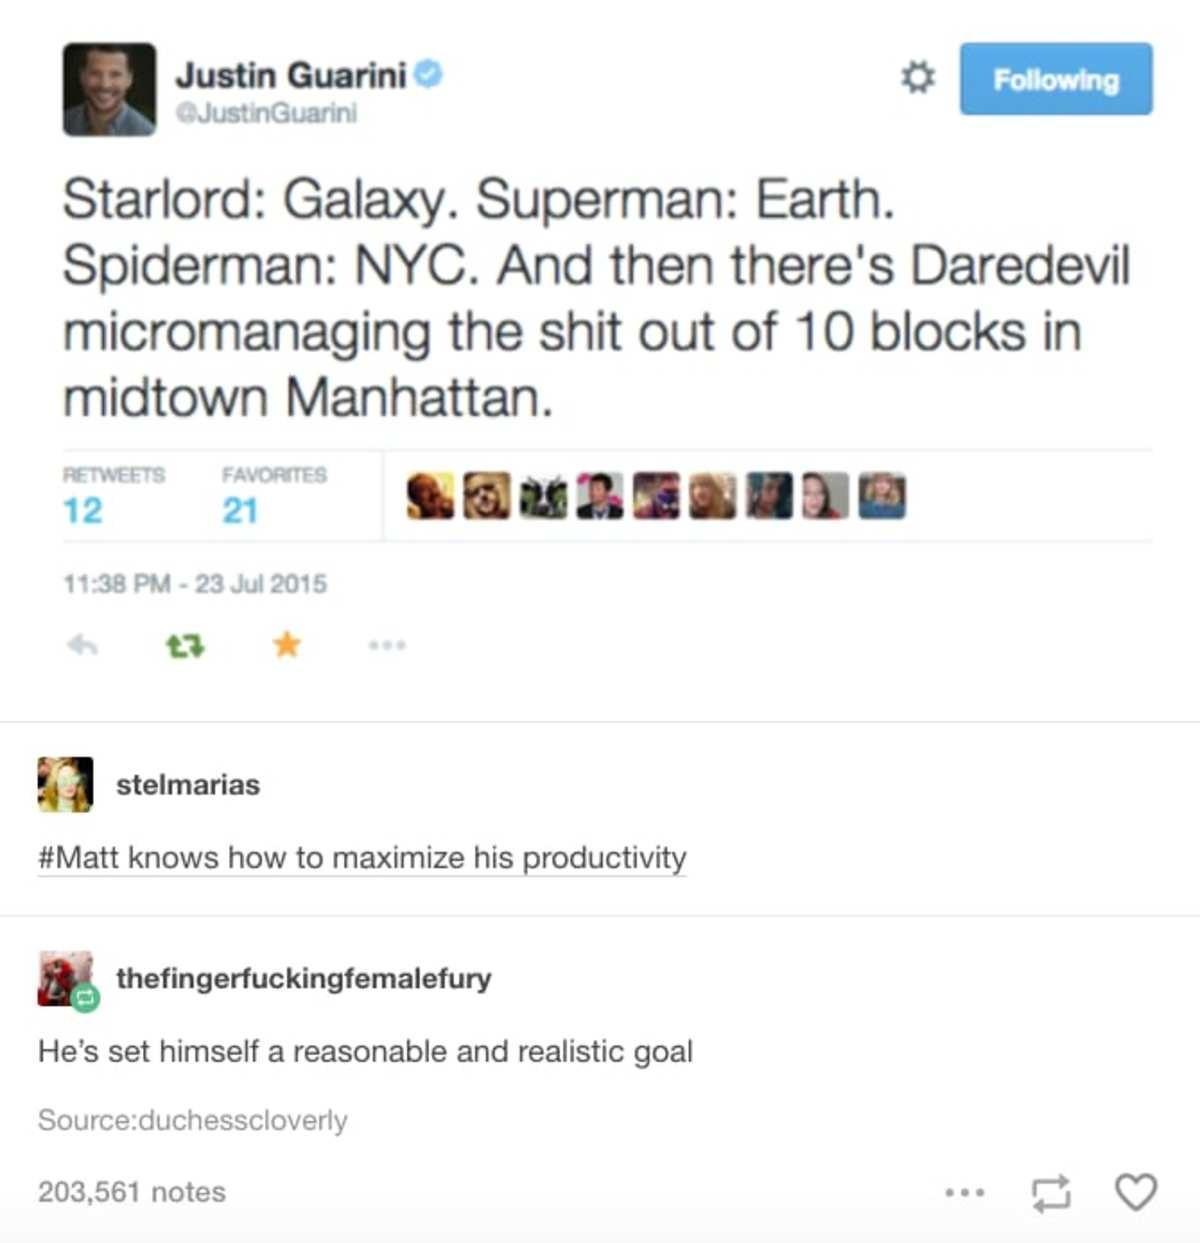 Reasonable. .. Mixing Marvel and DC..... Tsk tsk